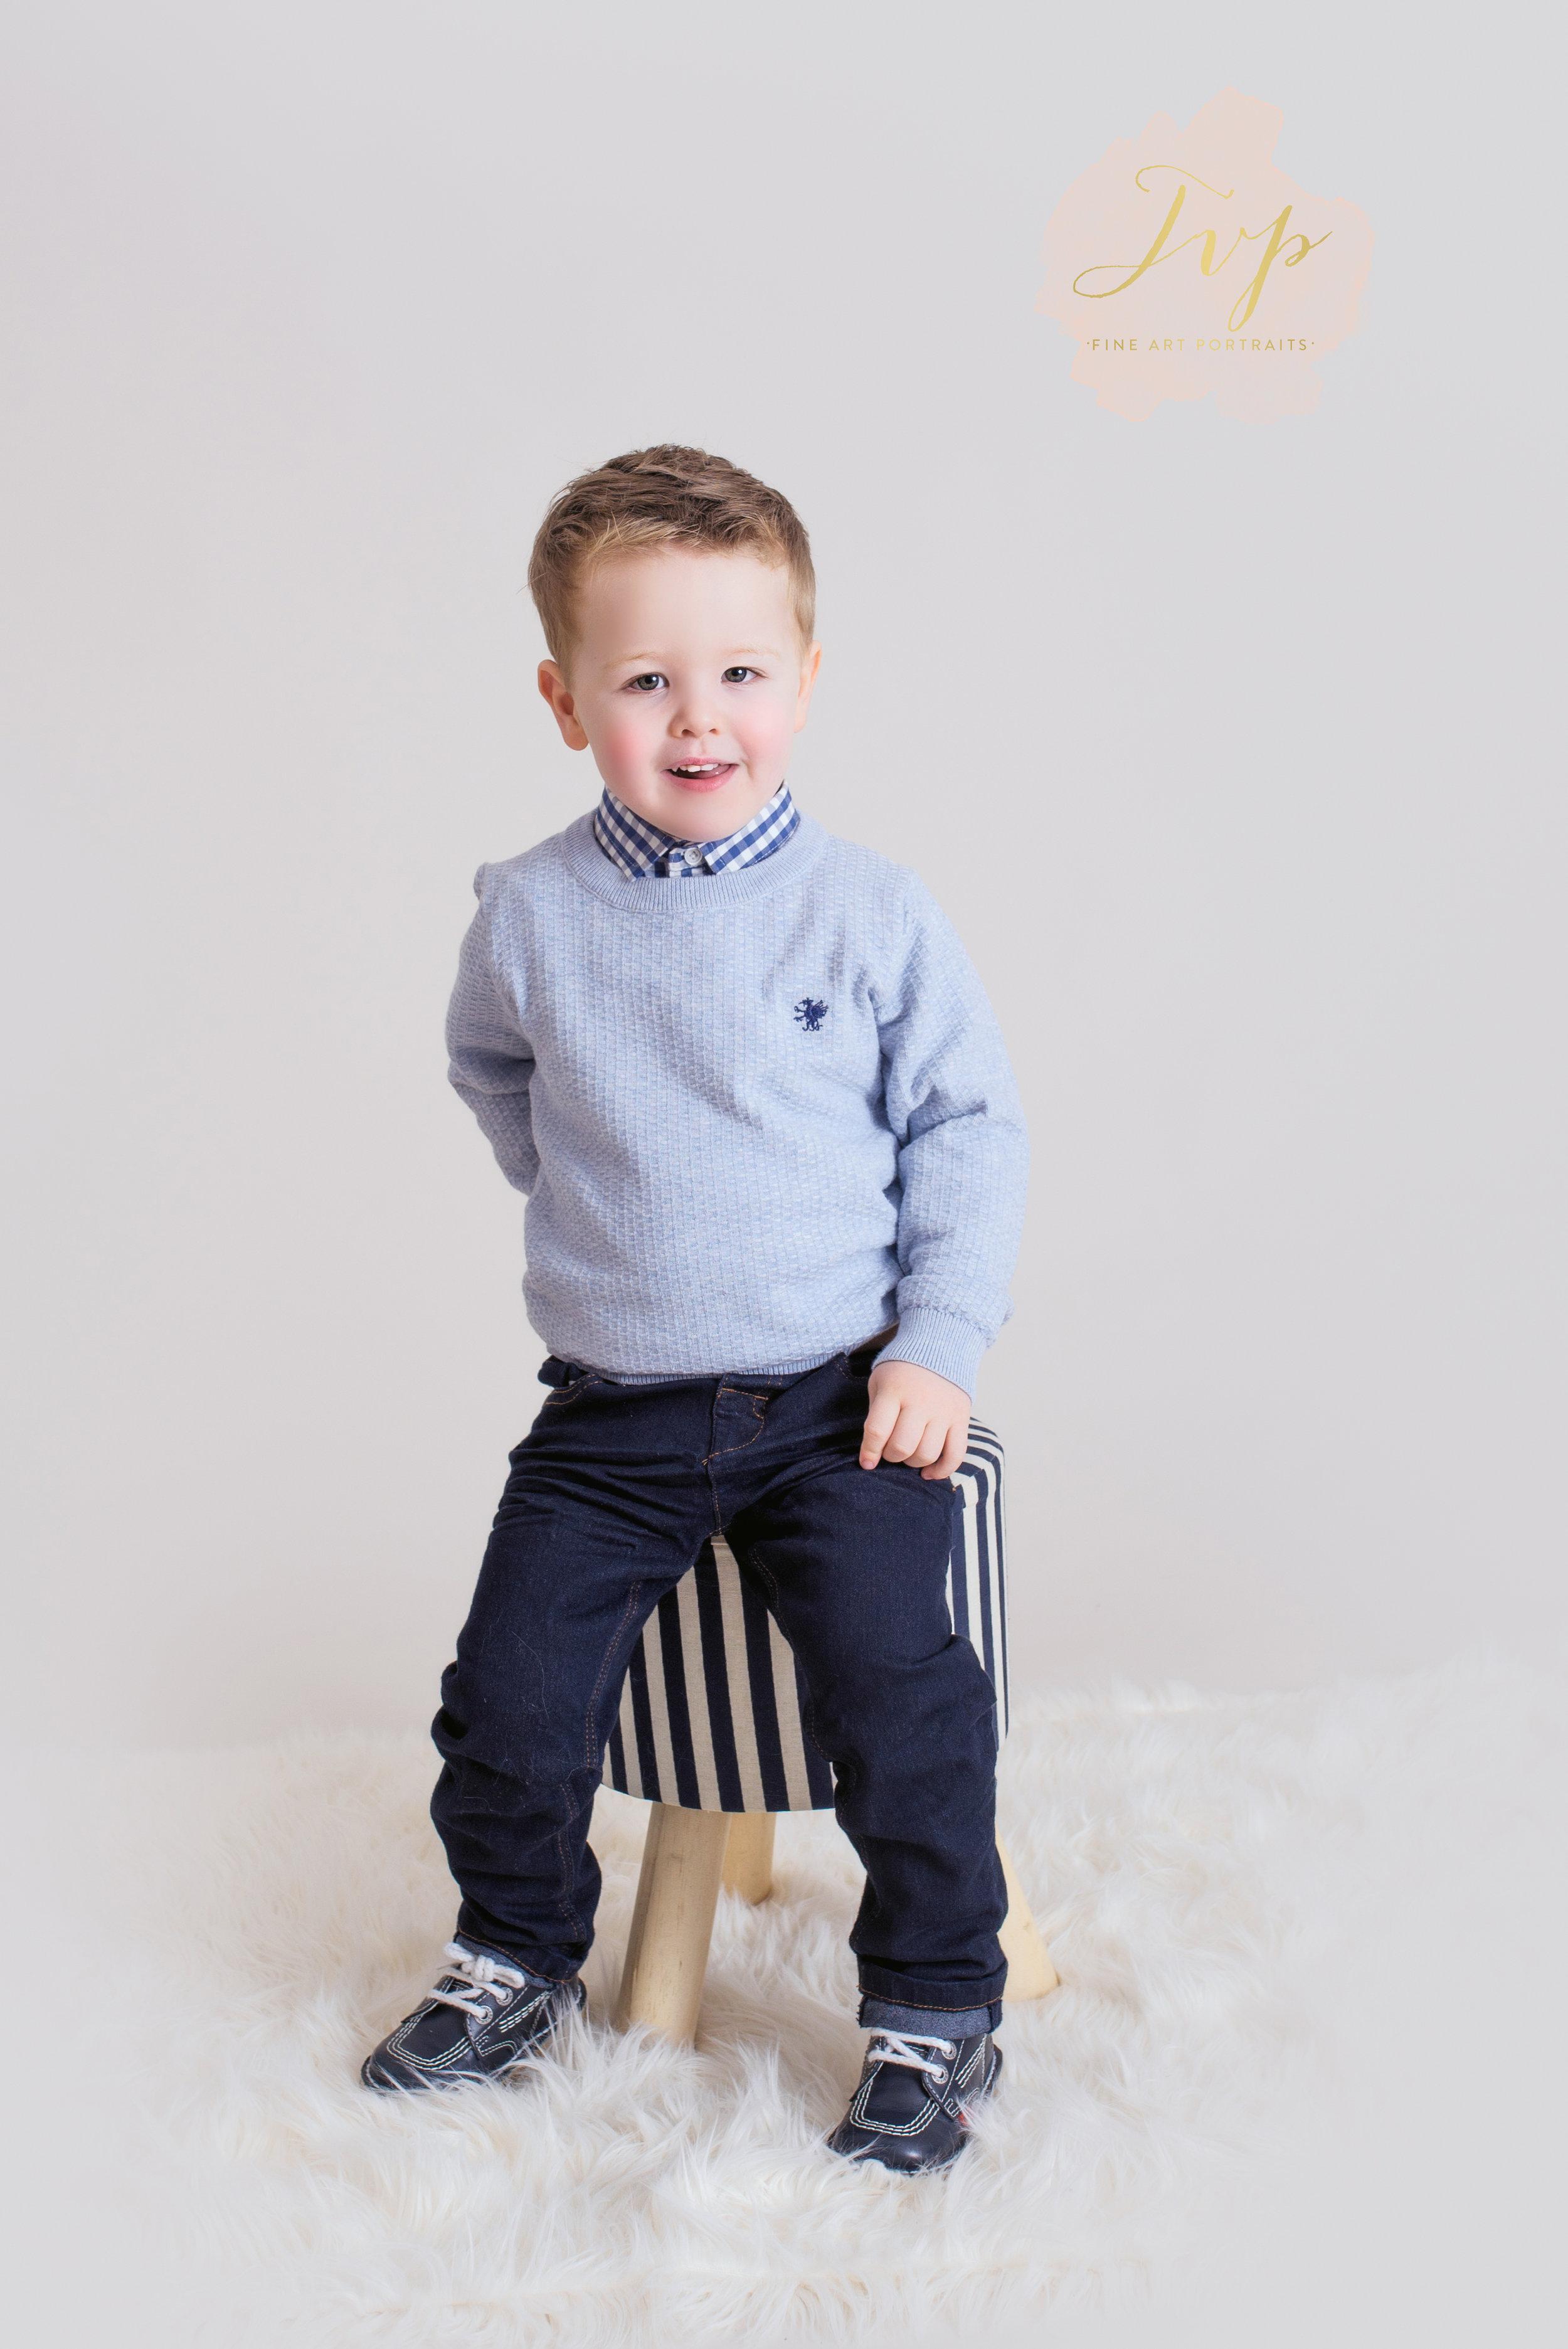 blue-jumper-family-photographer-glasgow